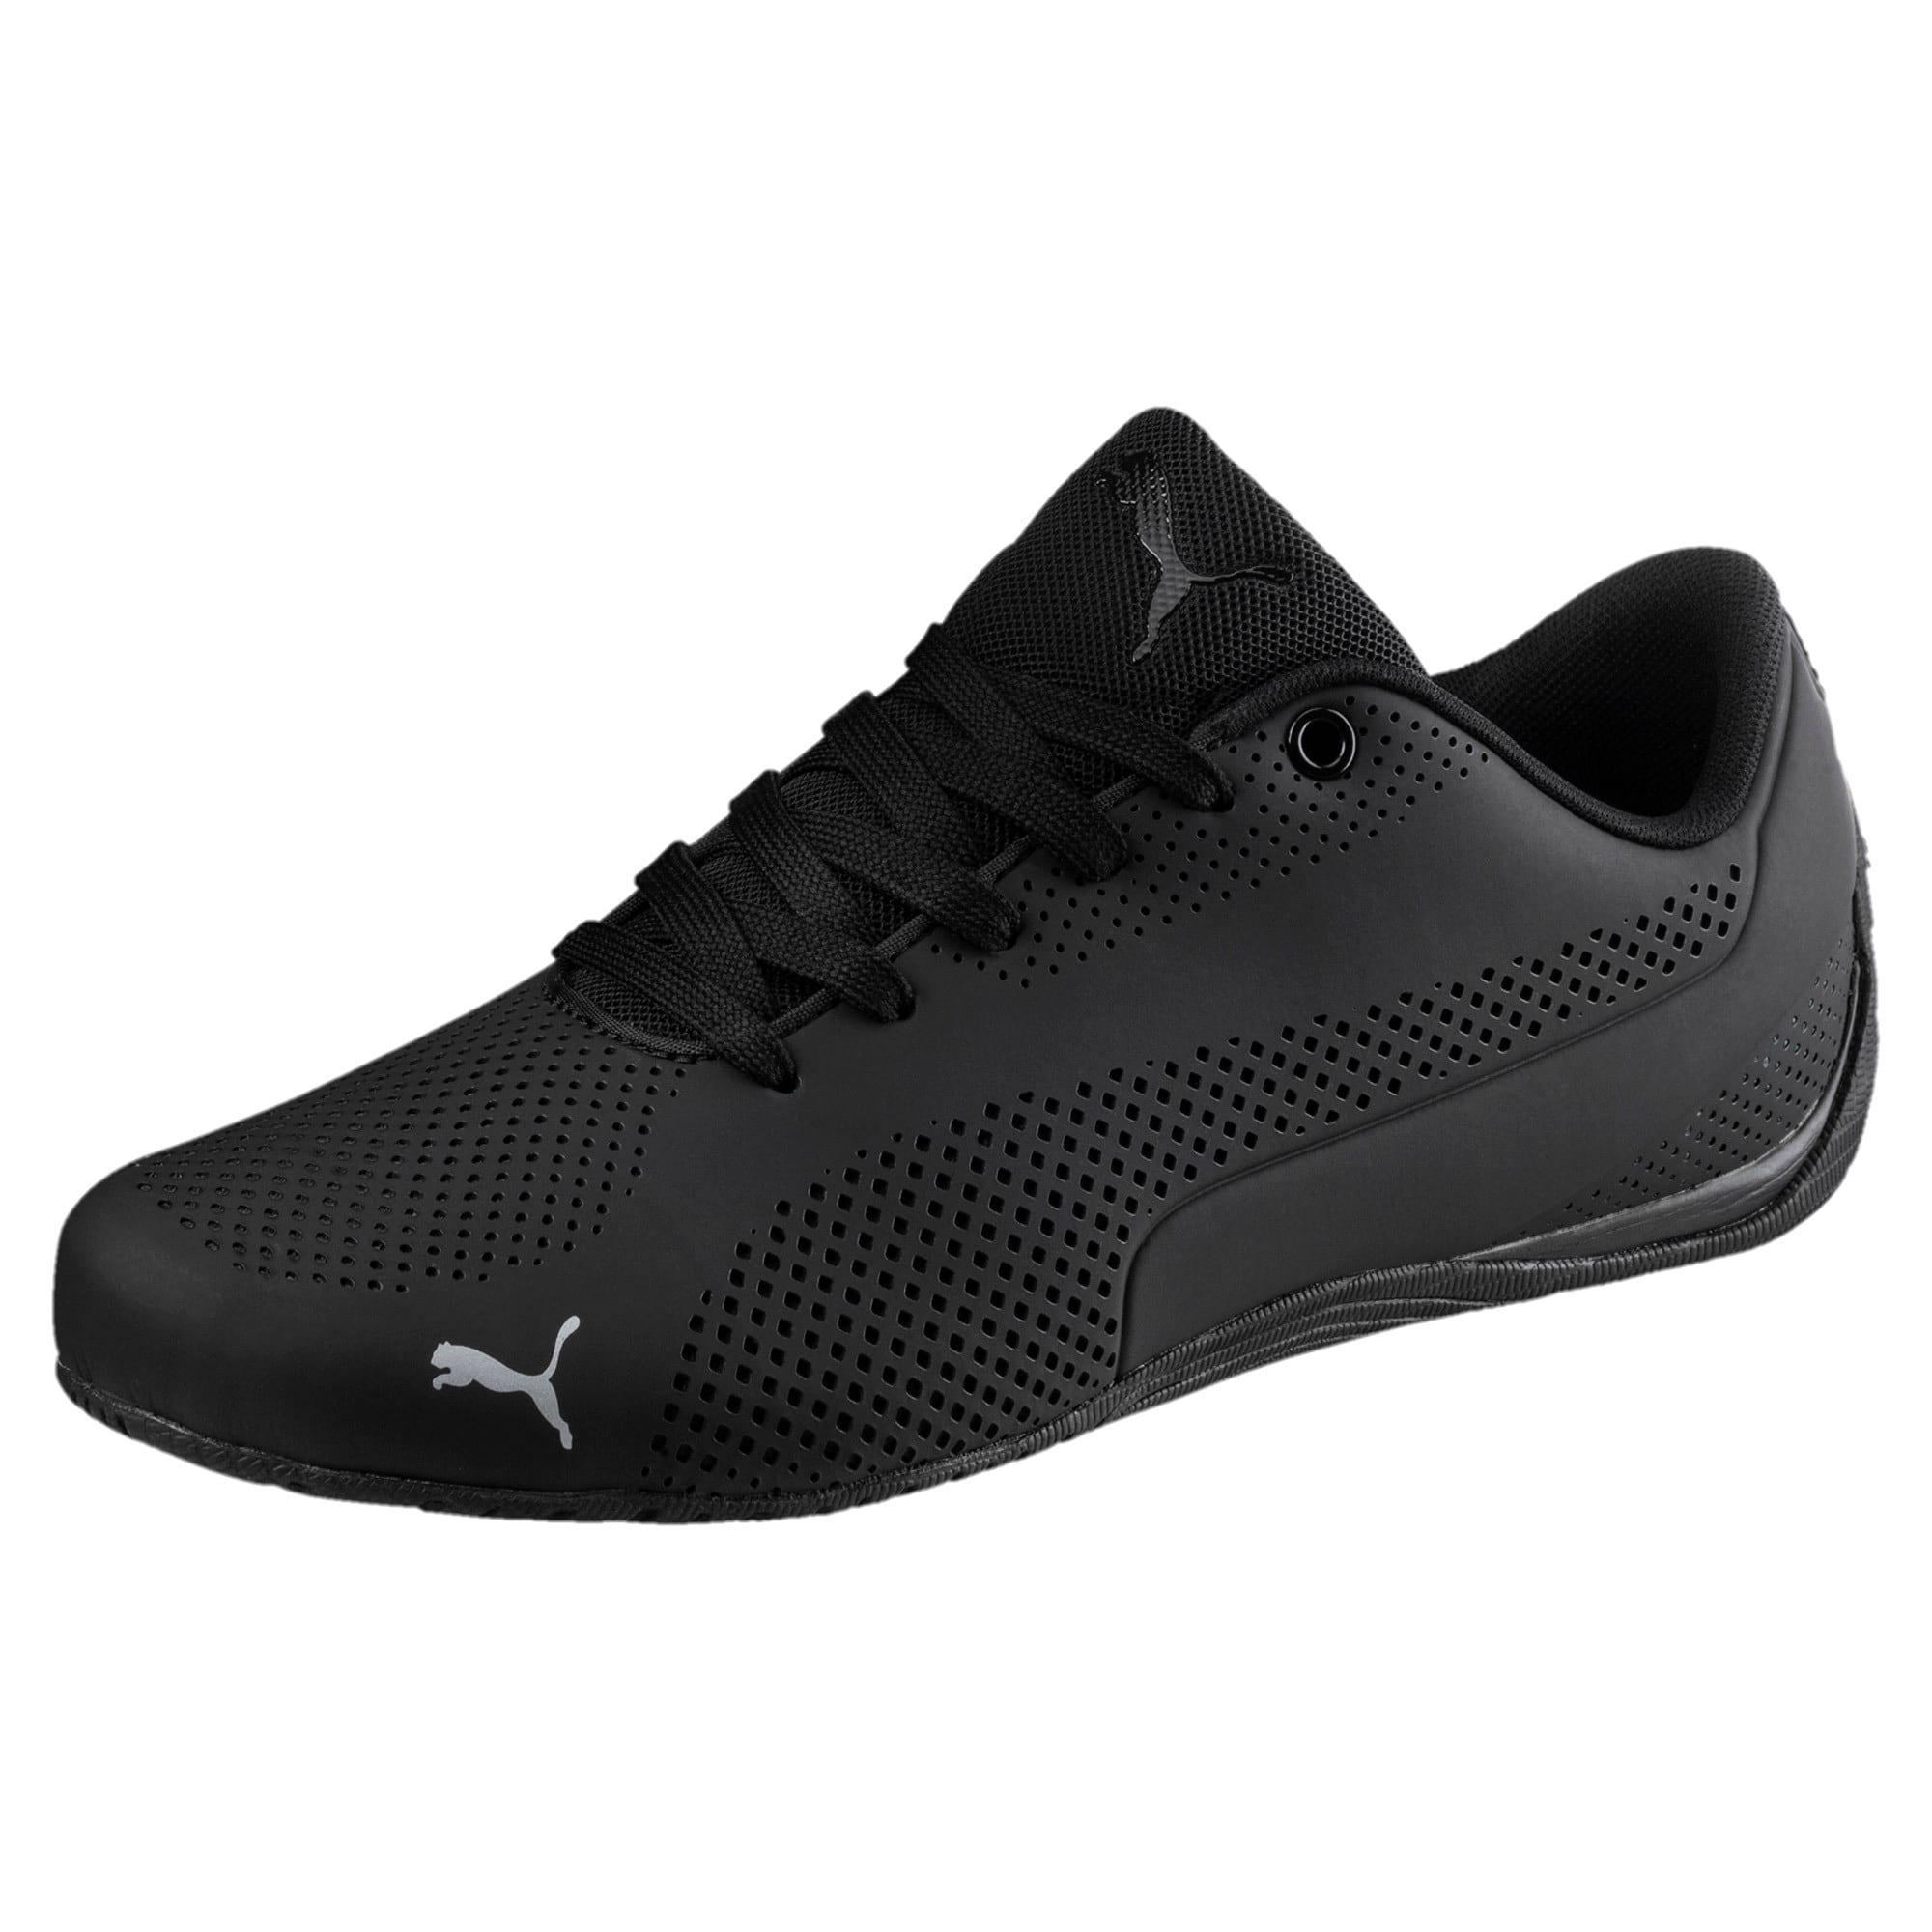 Thumbnail 1 of Drift Cat Ultra Reflective Shoes, Puma Black-Puma Black-Blk, medium